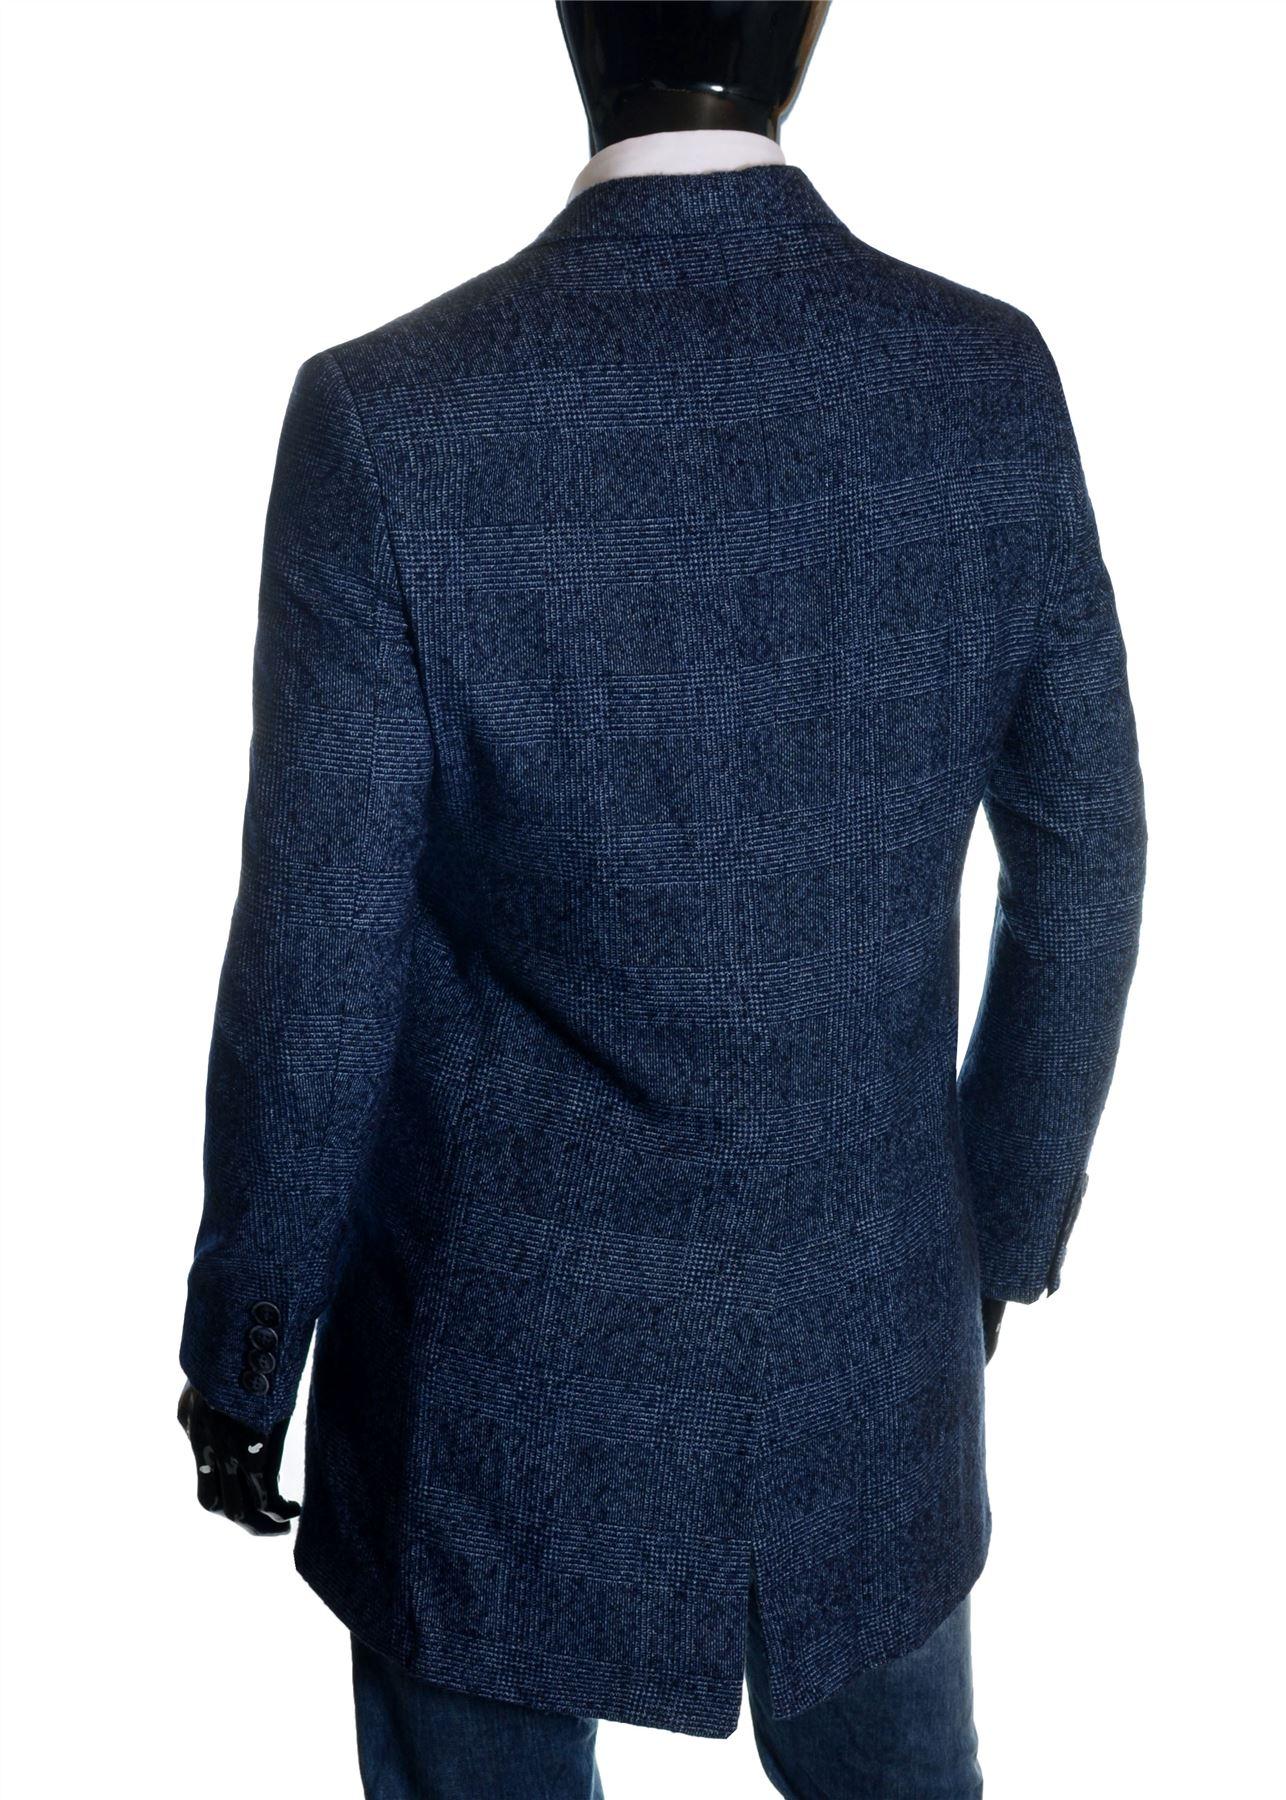 Men-039-s-Checkered-Coat-3-4-Long-Tweed-Cashmere-Wool-Trendy-Formal-Winter-Overcoat thumbnail 11